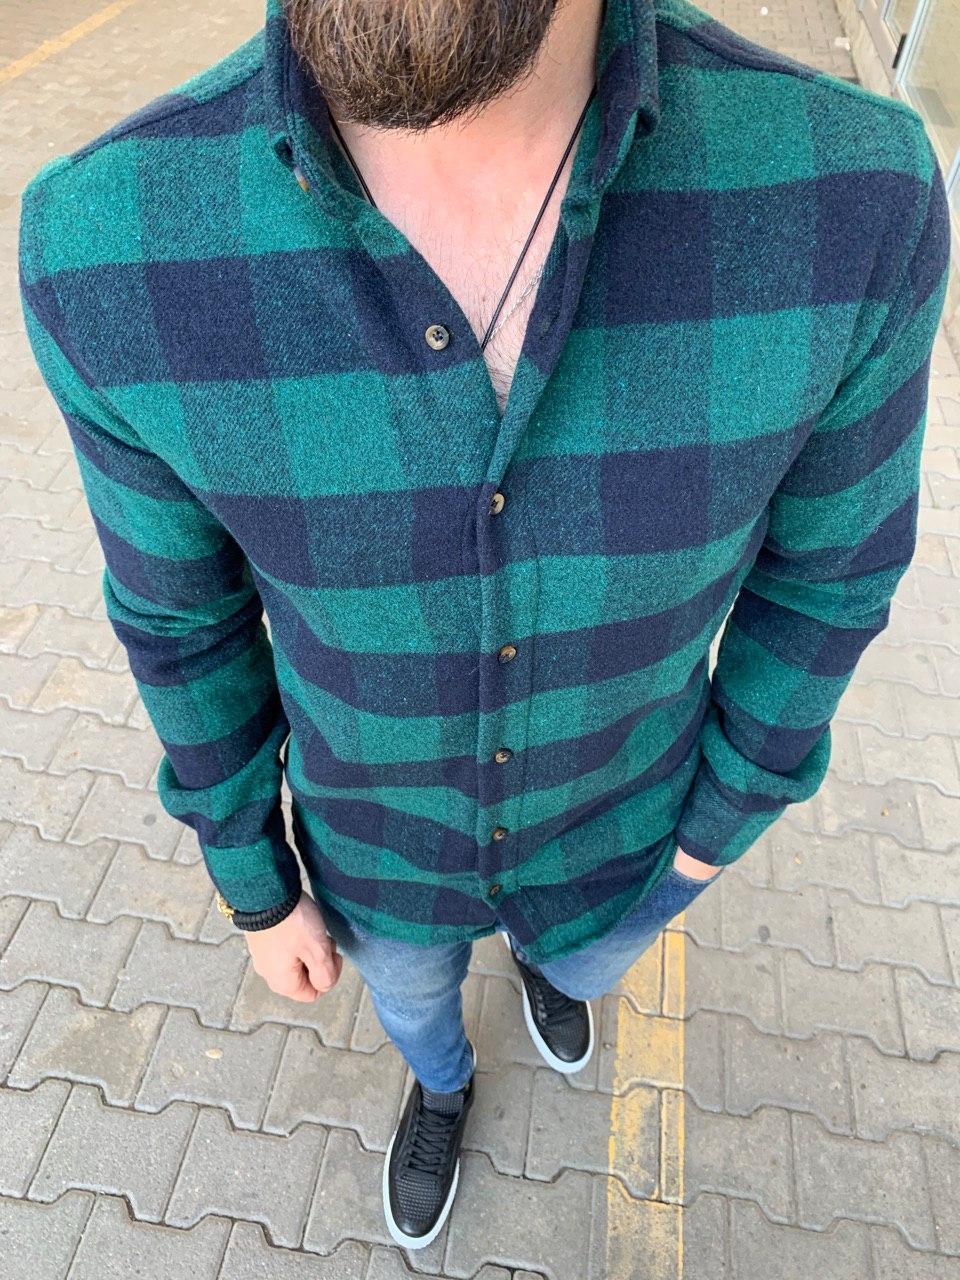 😜Рубашка - мужская теплая байковая рубашка зеленая